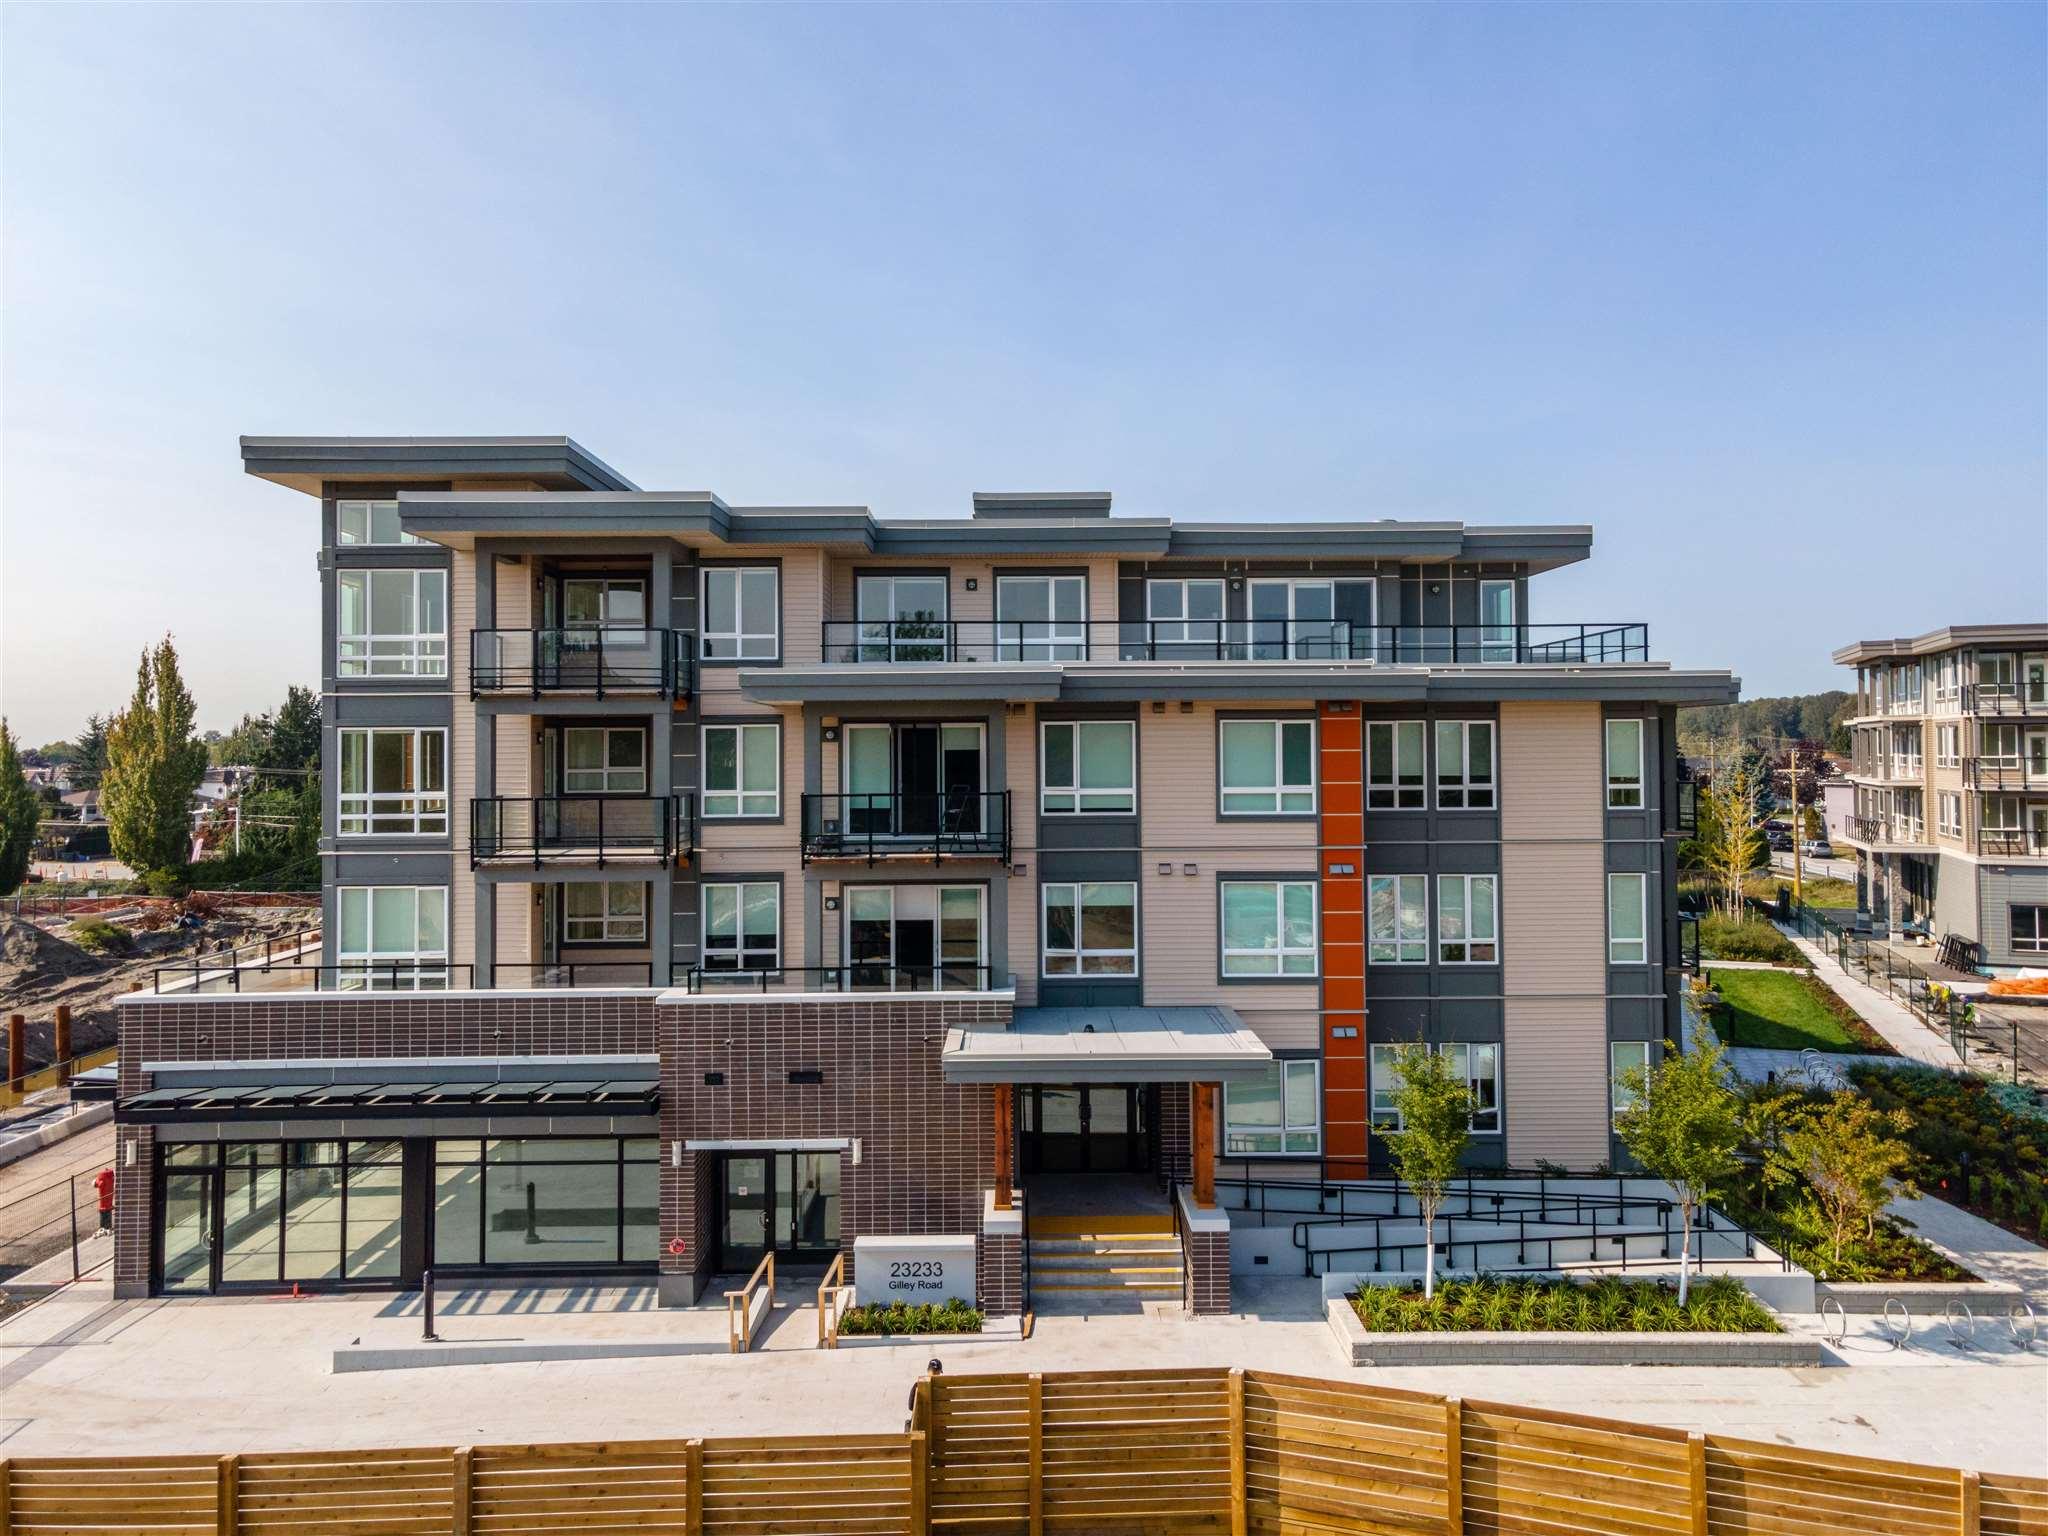 104 23233 GILLEY ROAD - Hamilton RI Apartment/Condo for sale, 2 Bedrooms (R2602917)